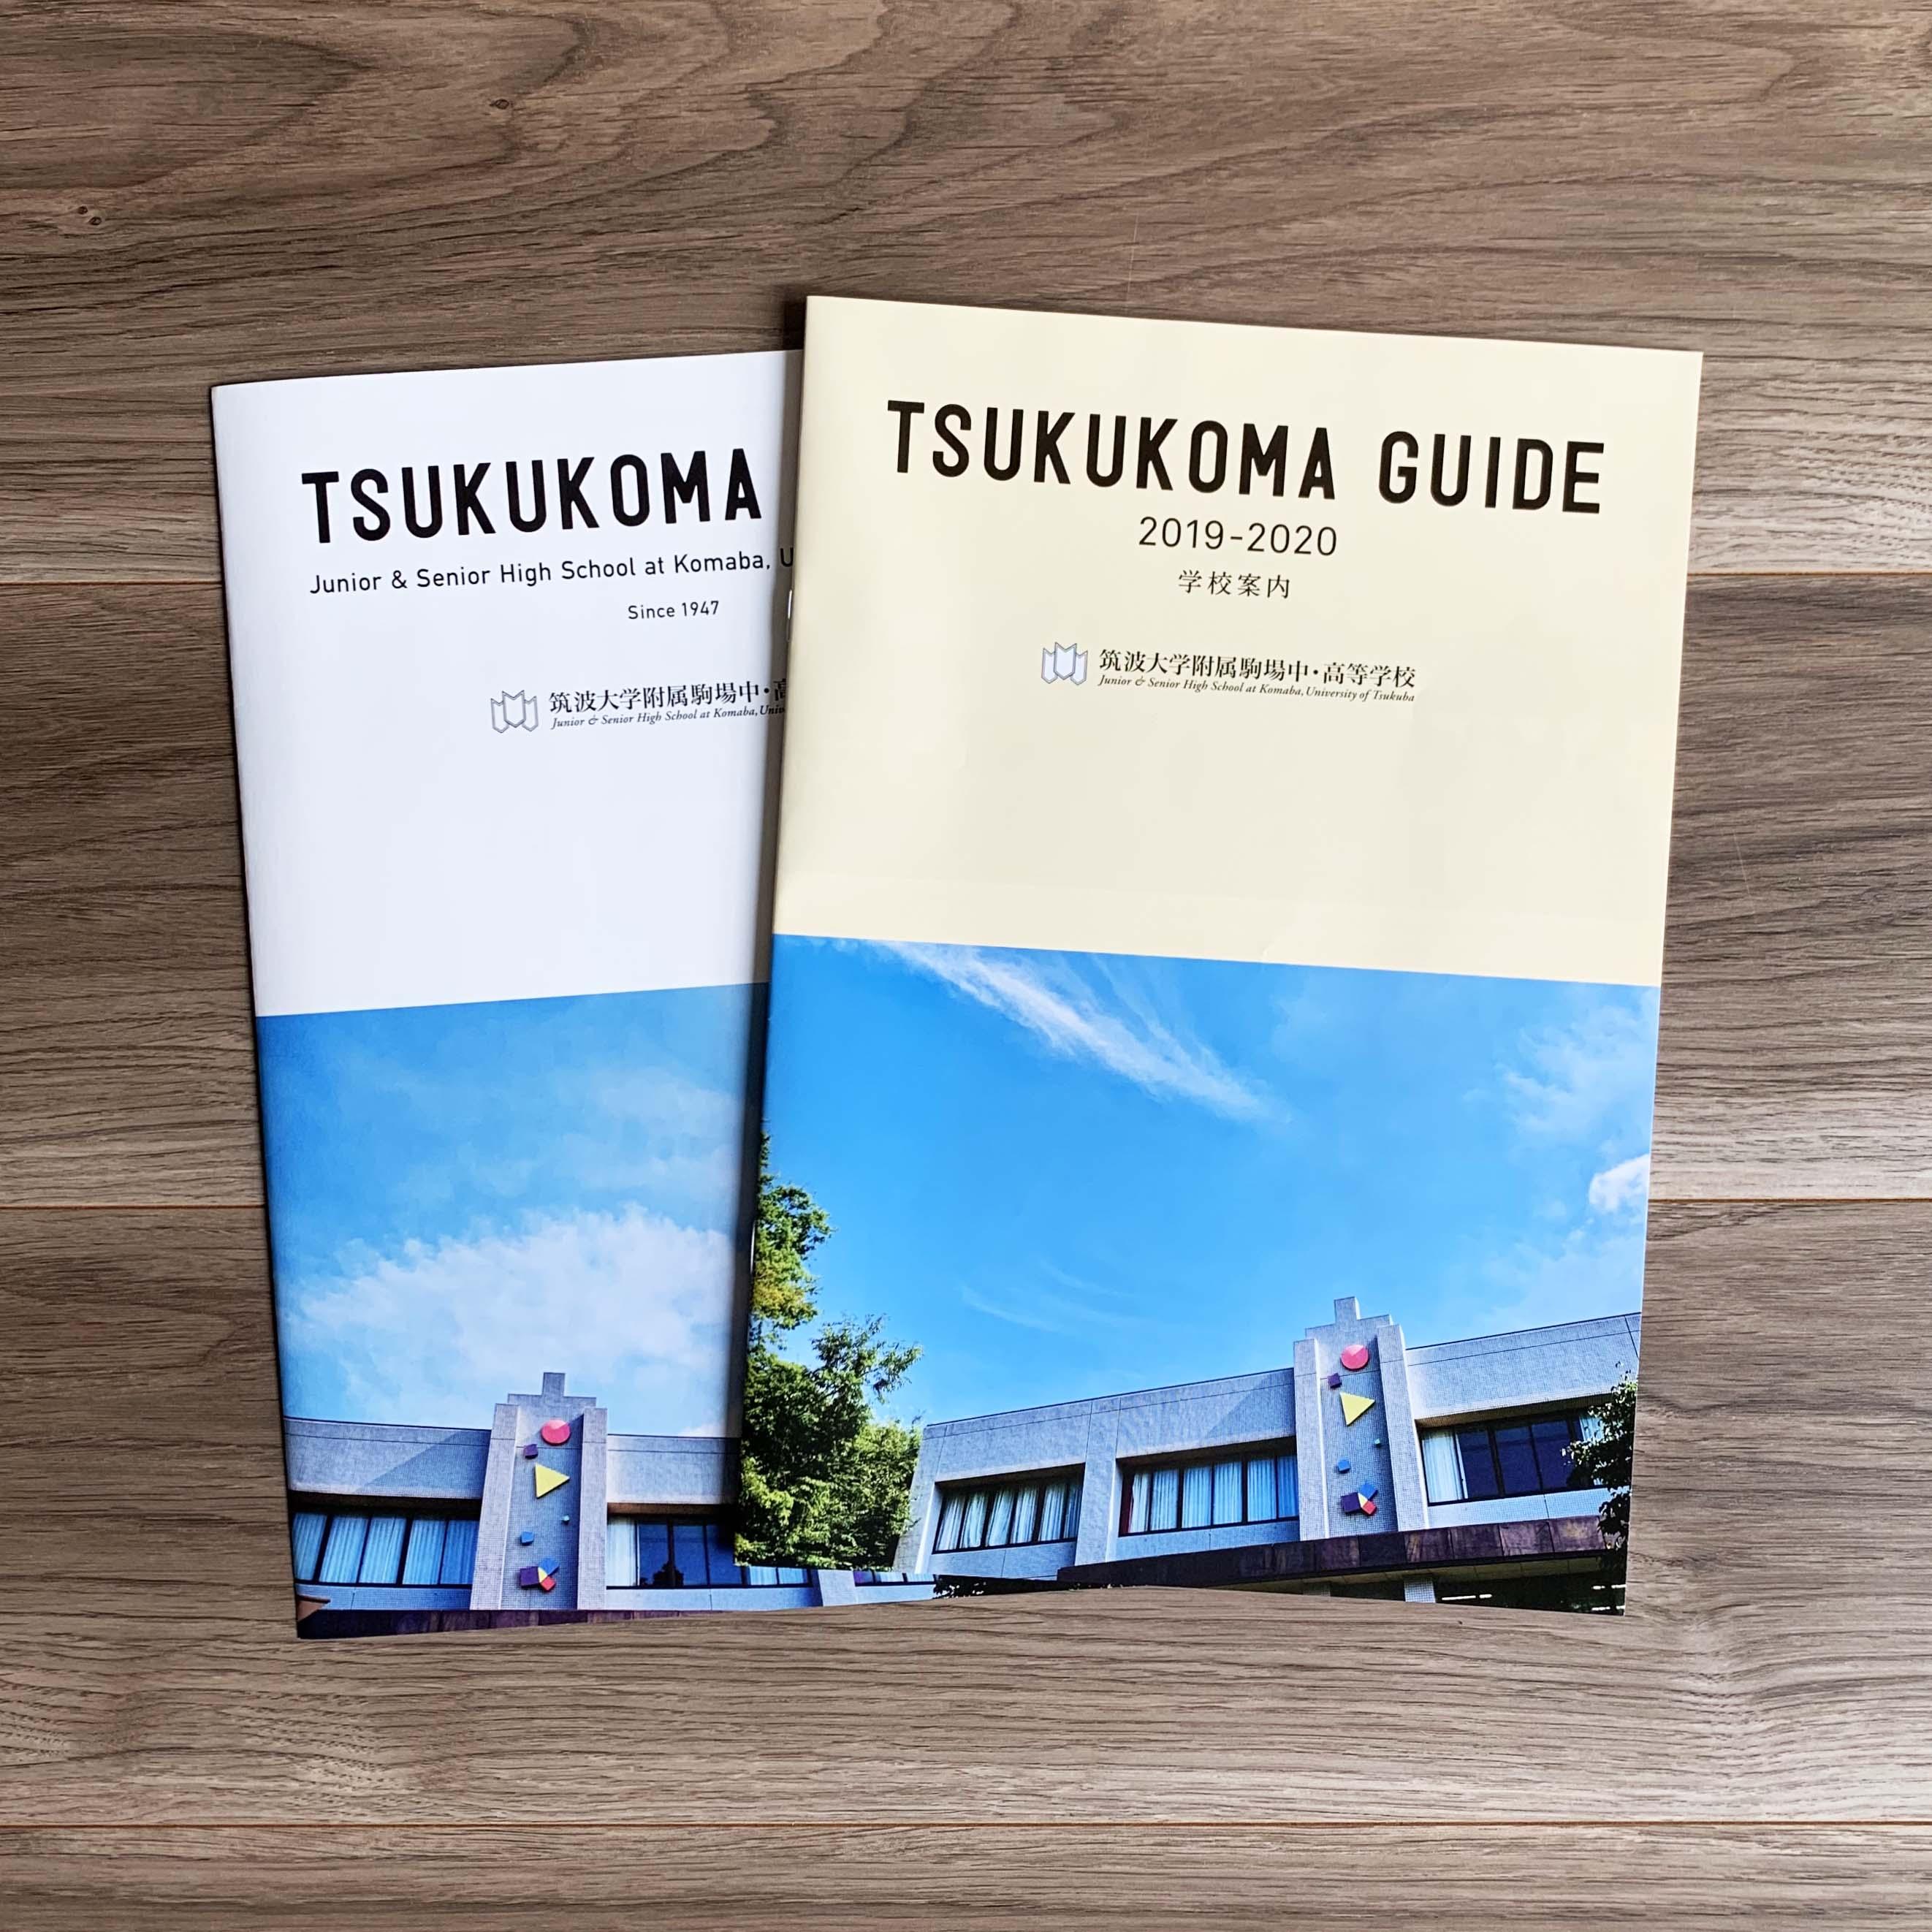 TSUKUKOMA 2019-2020